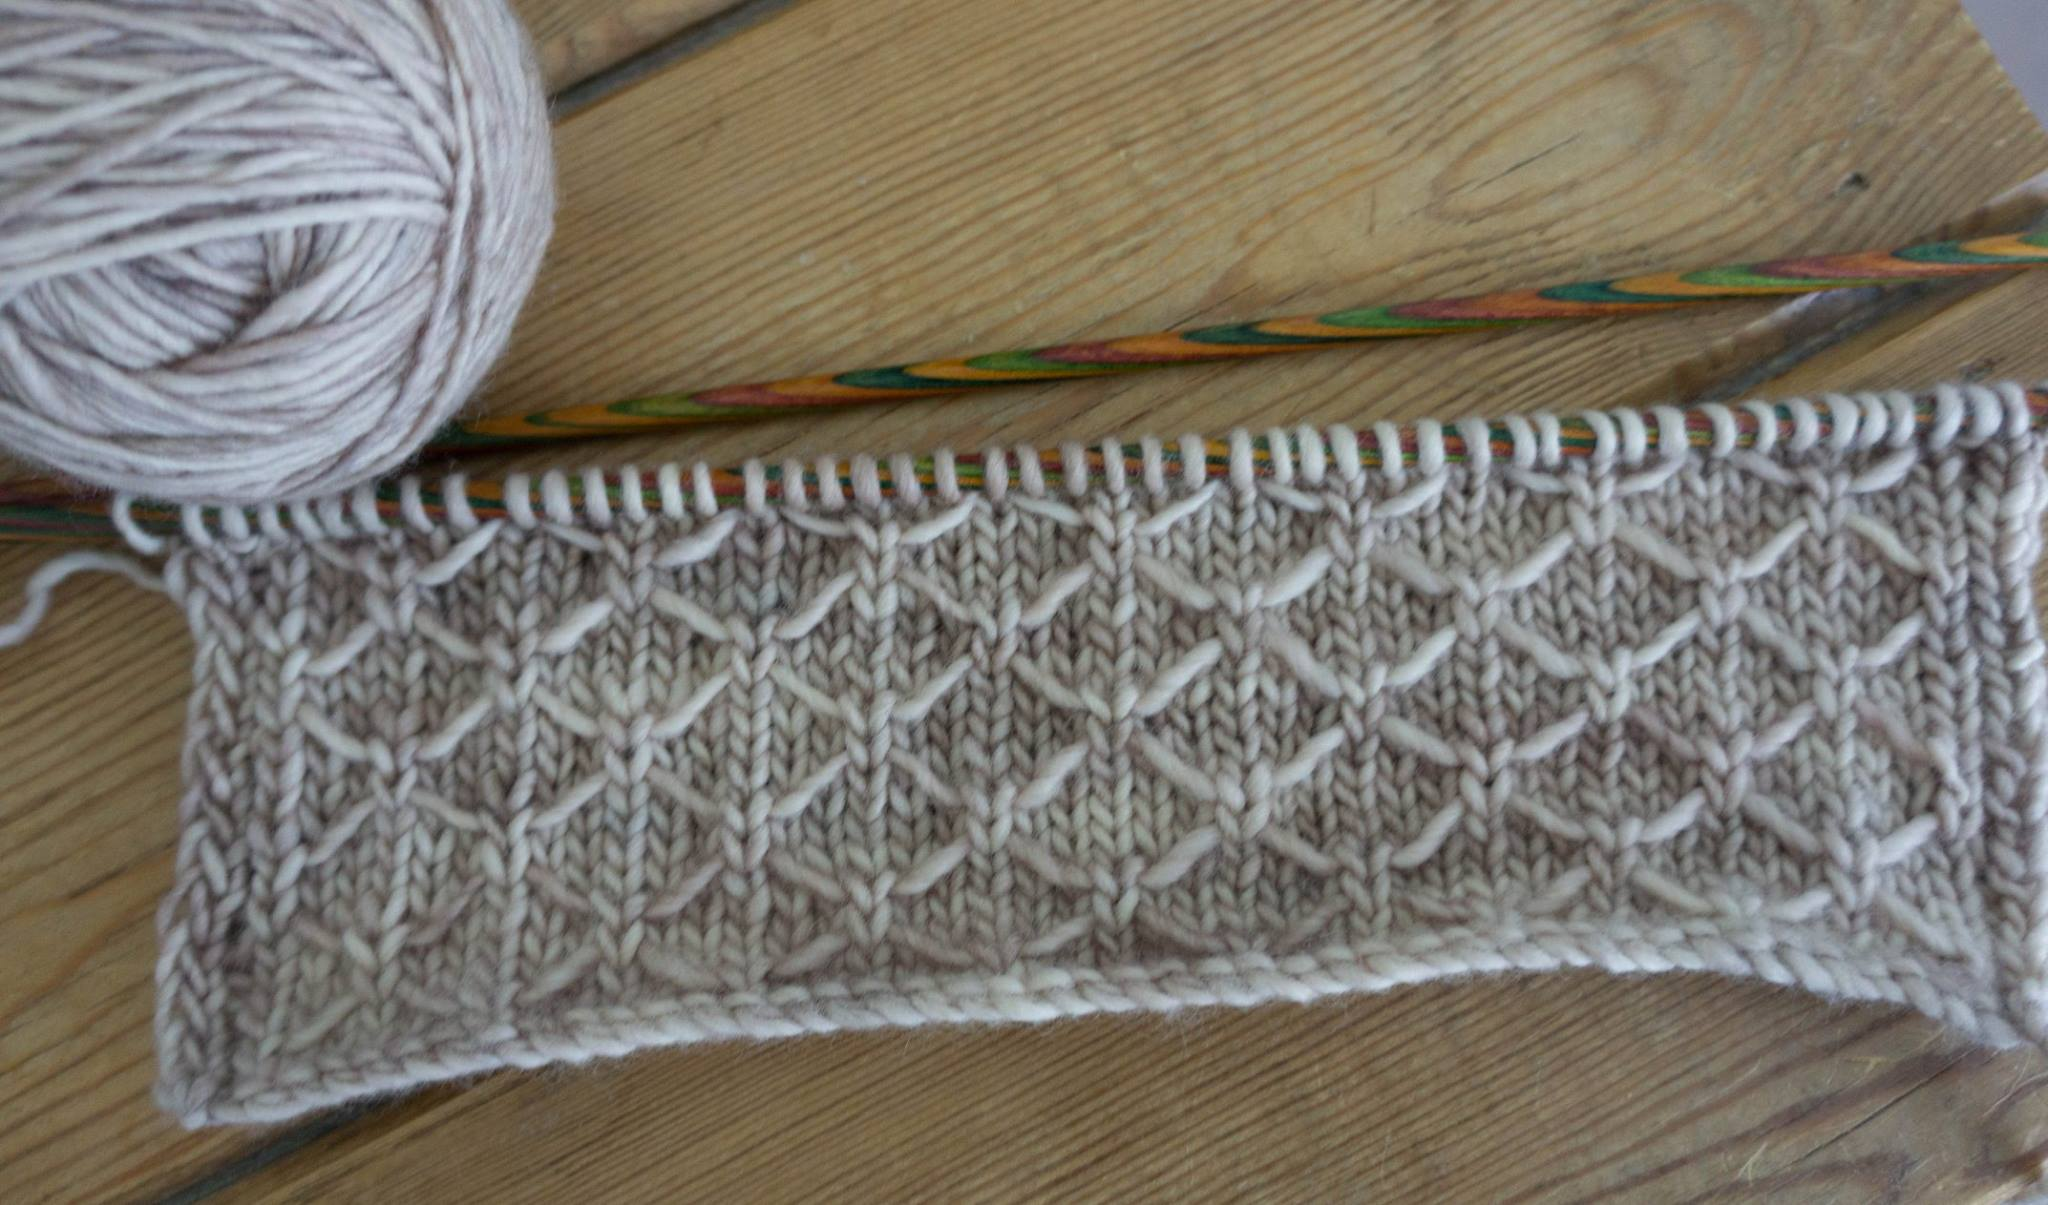 Knitting Quilted Lattice Stitch : Around the world blog hop! The Crimson Rabbit